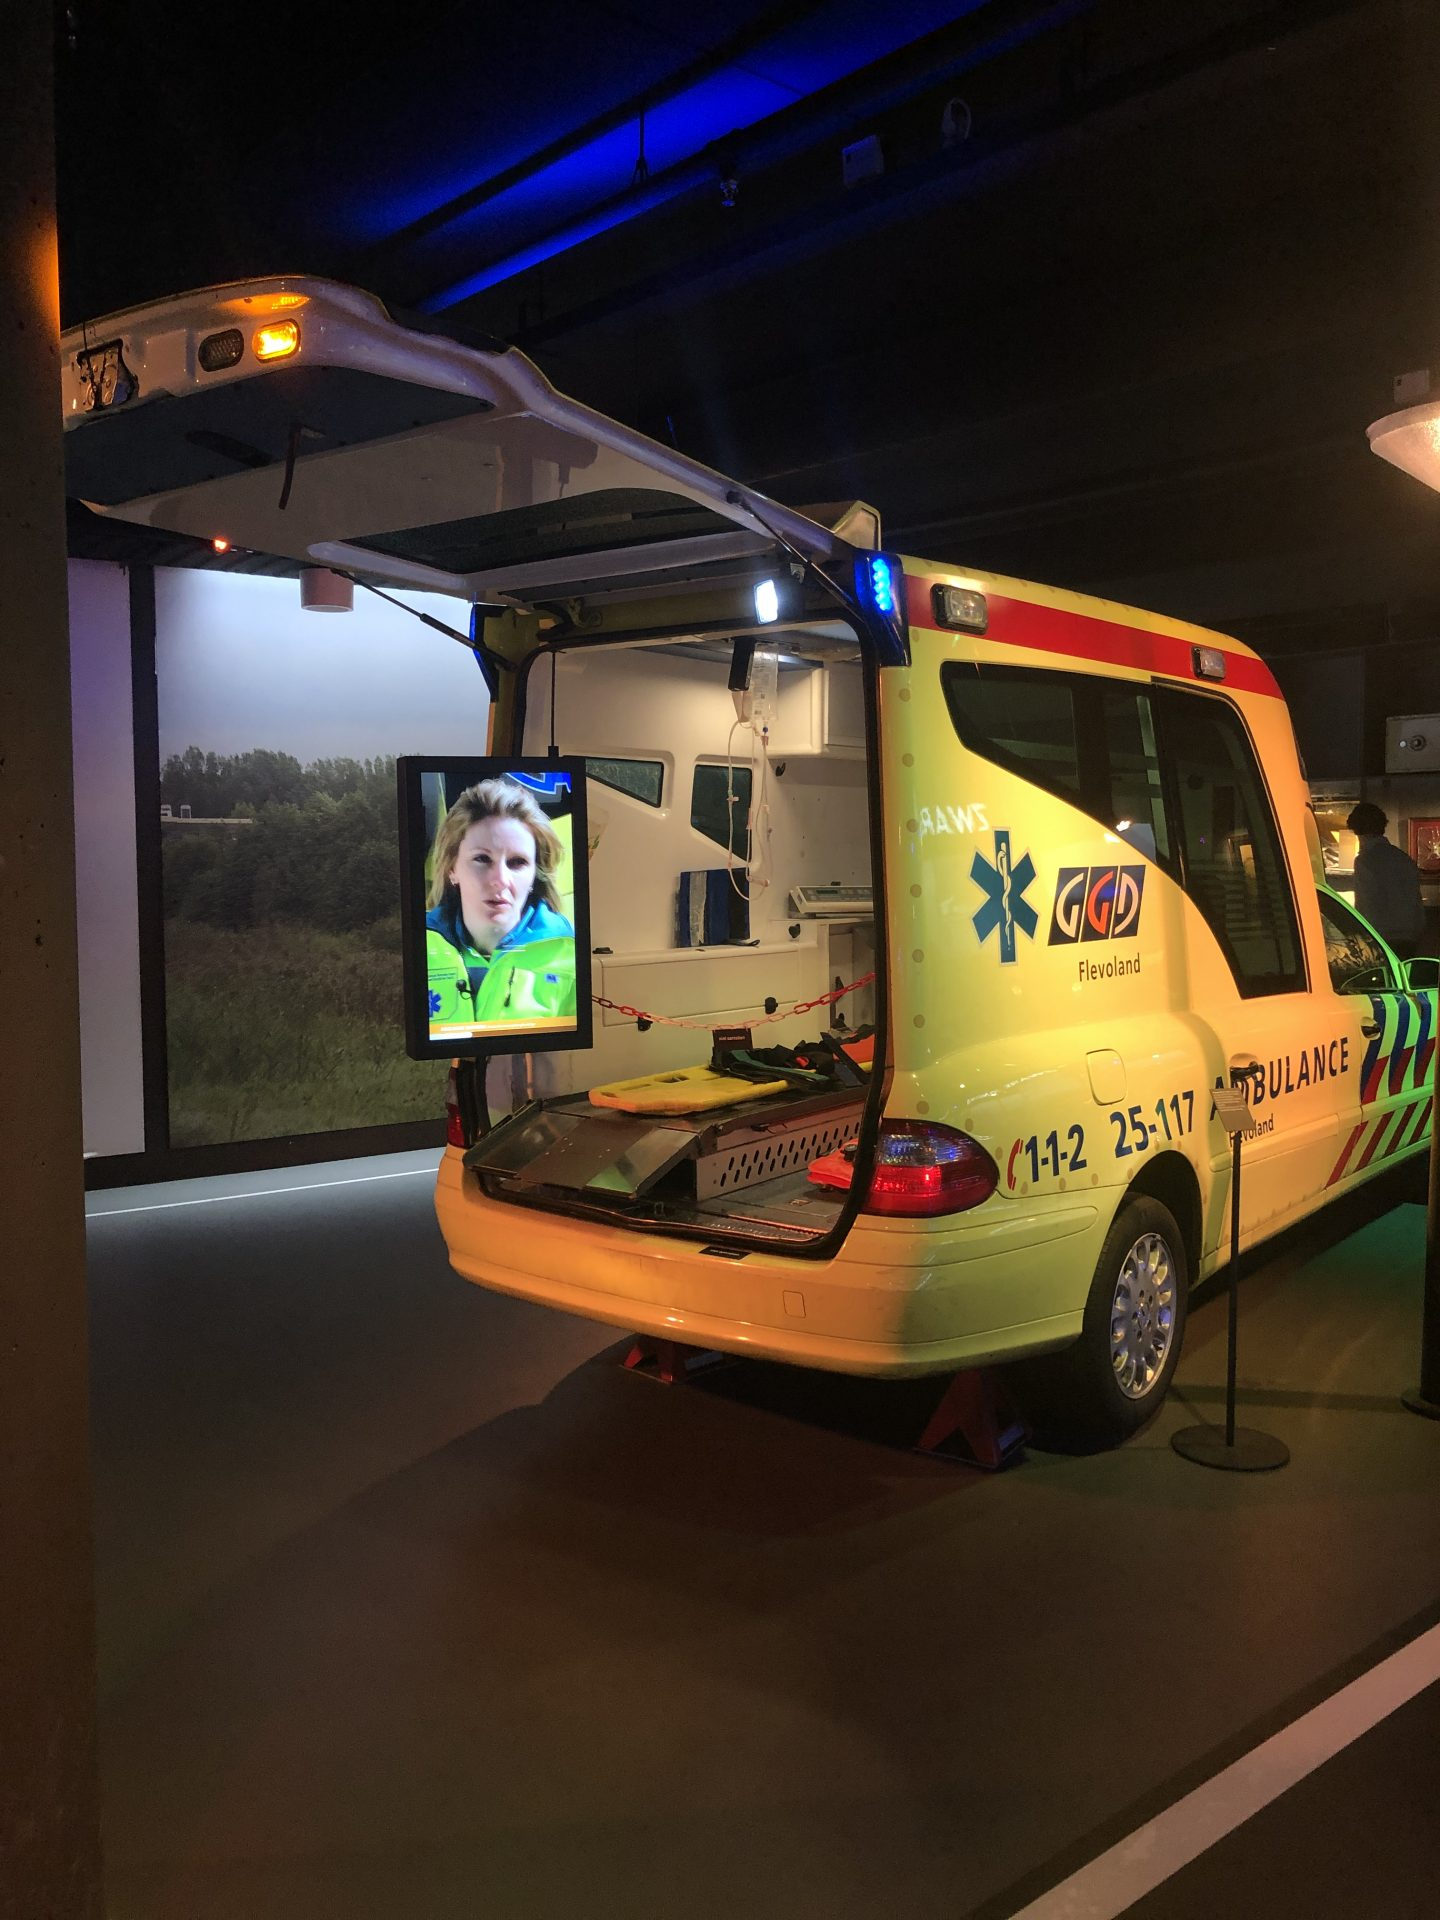 Pit Veiligheidsmuseum Almere